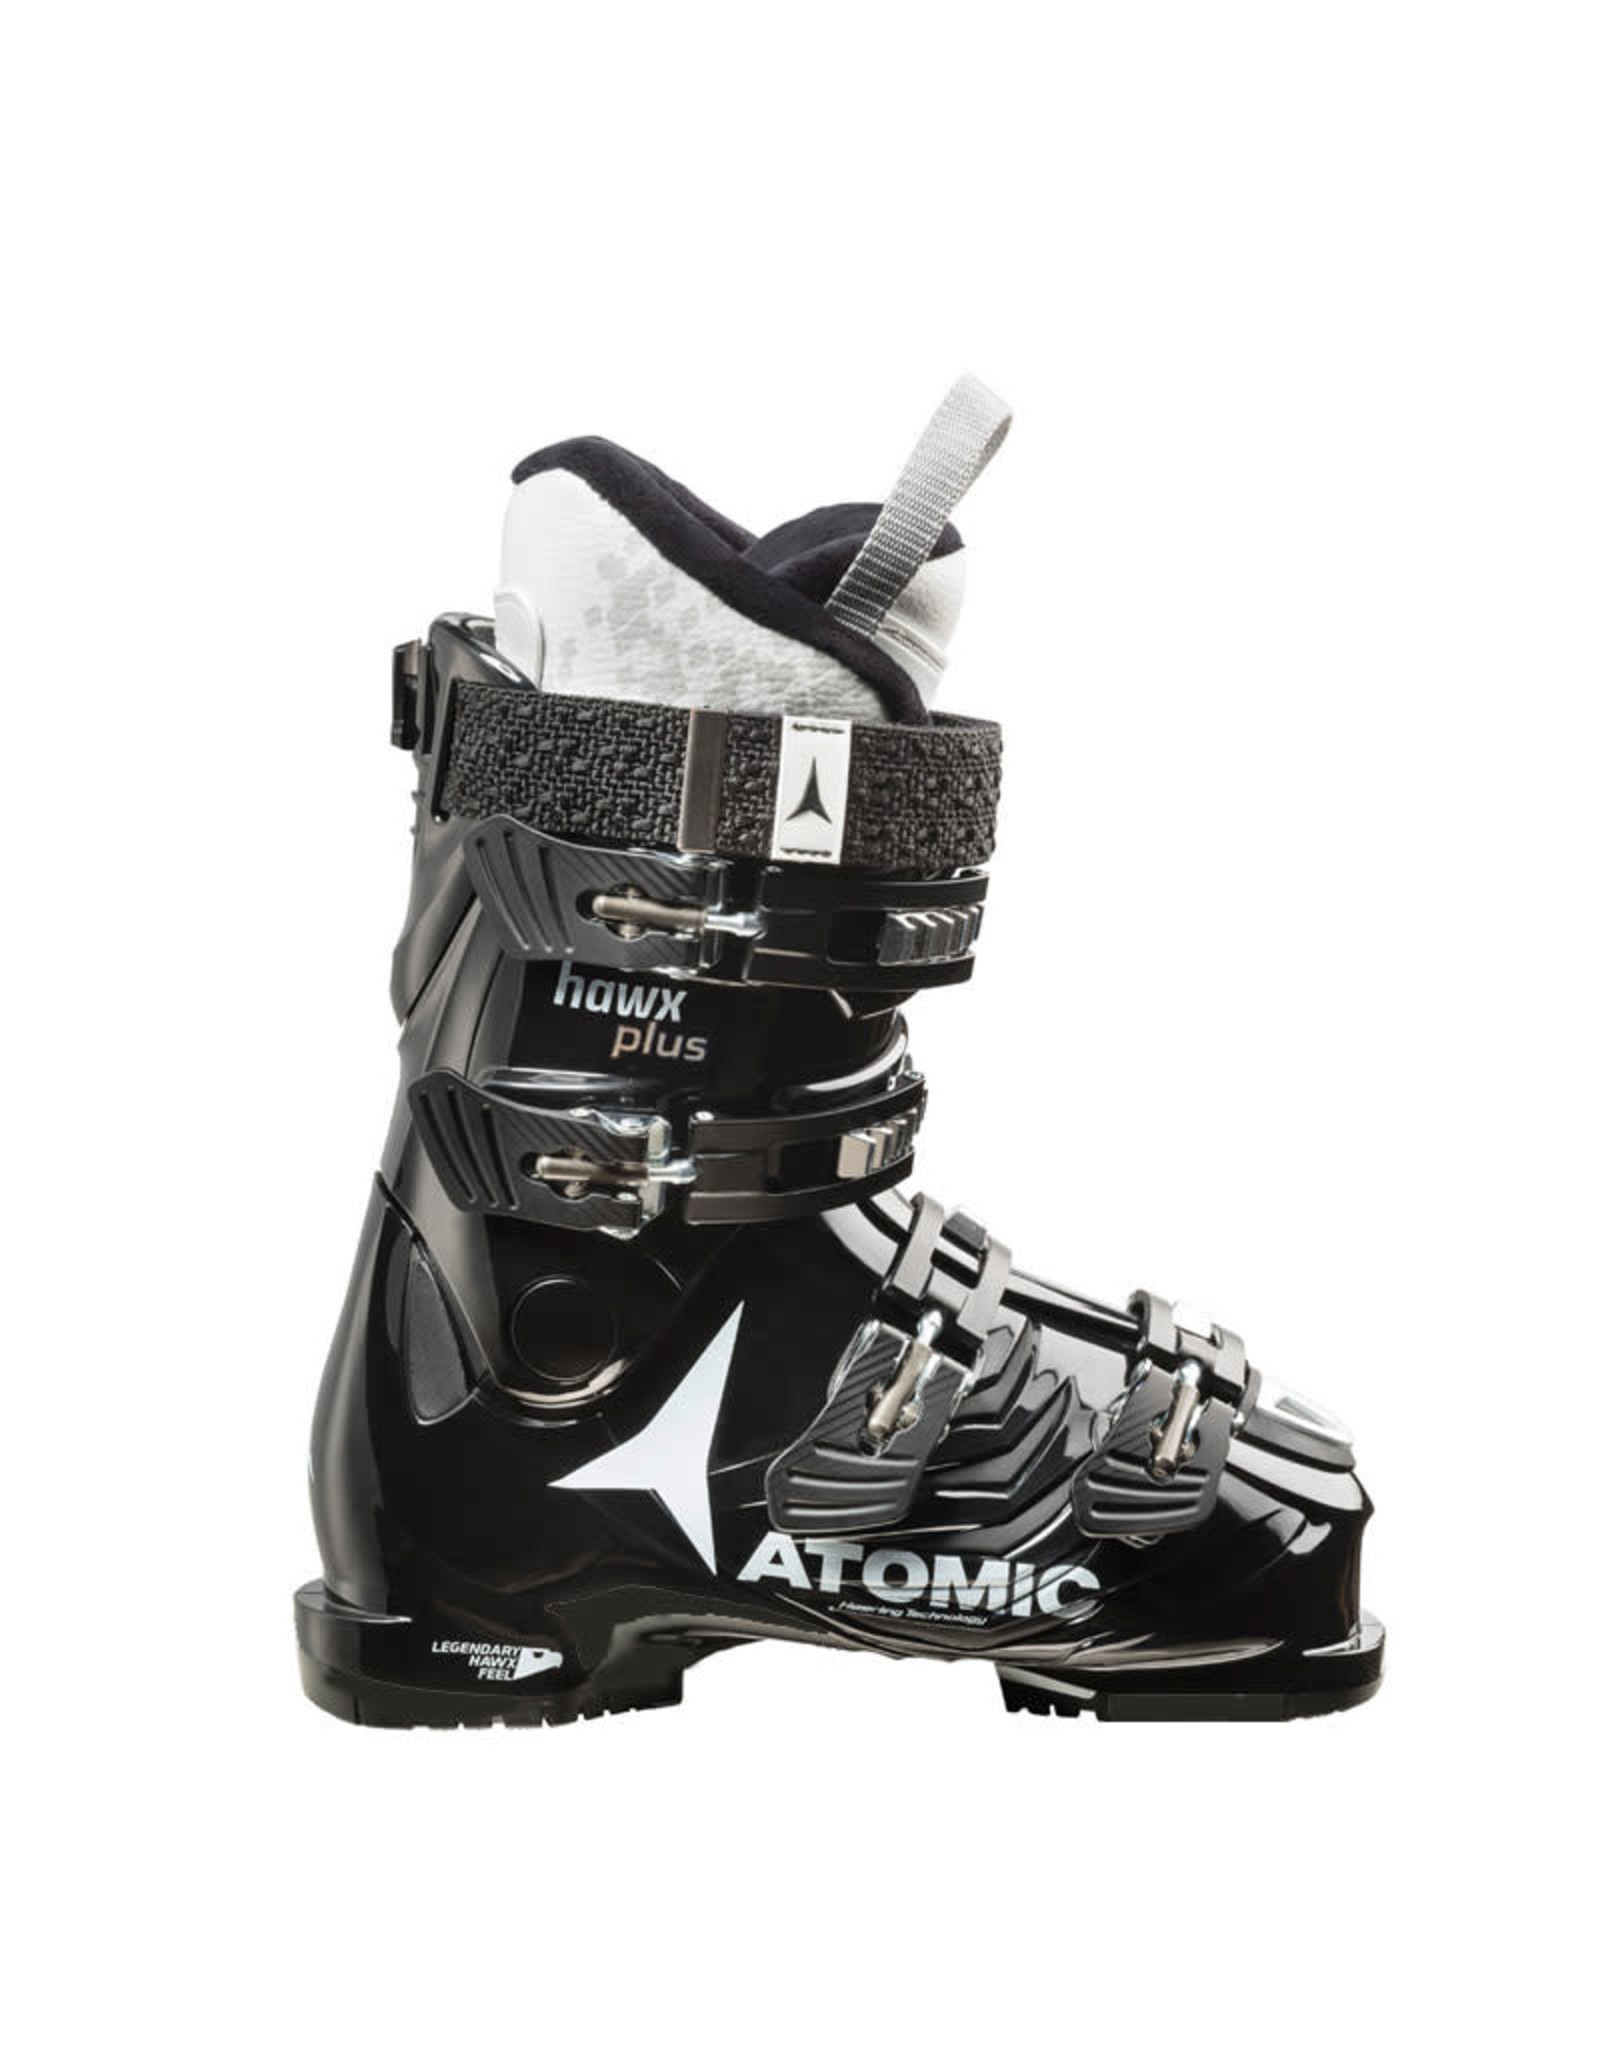 ATOMIC Skischoenen ATOMIC Hawx 1.0 Plus (n) Gebruikt